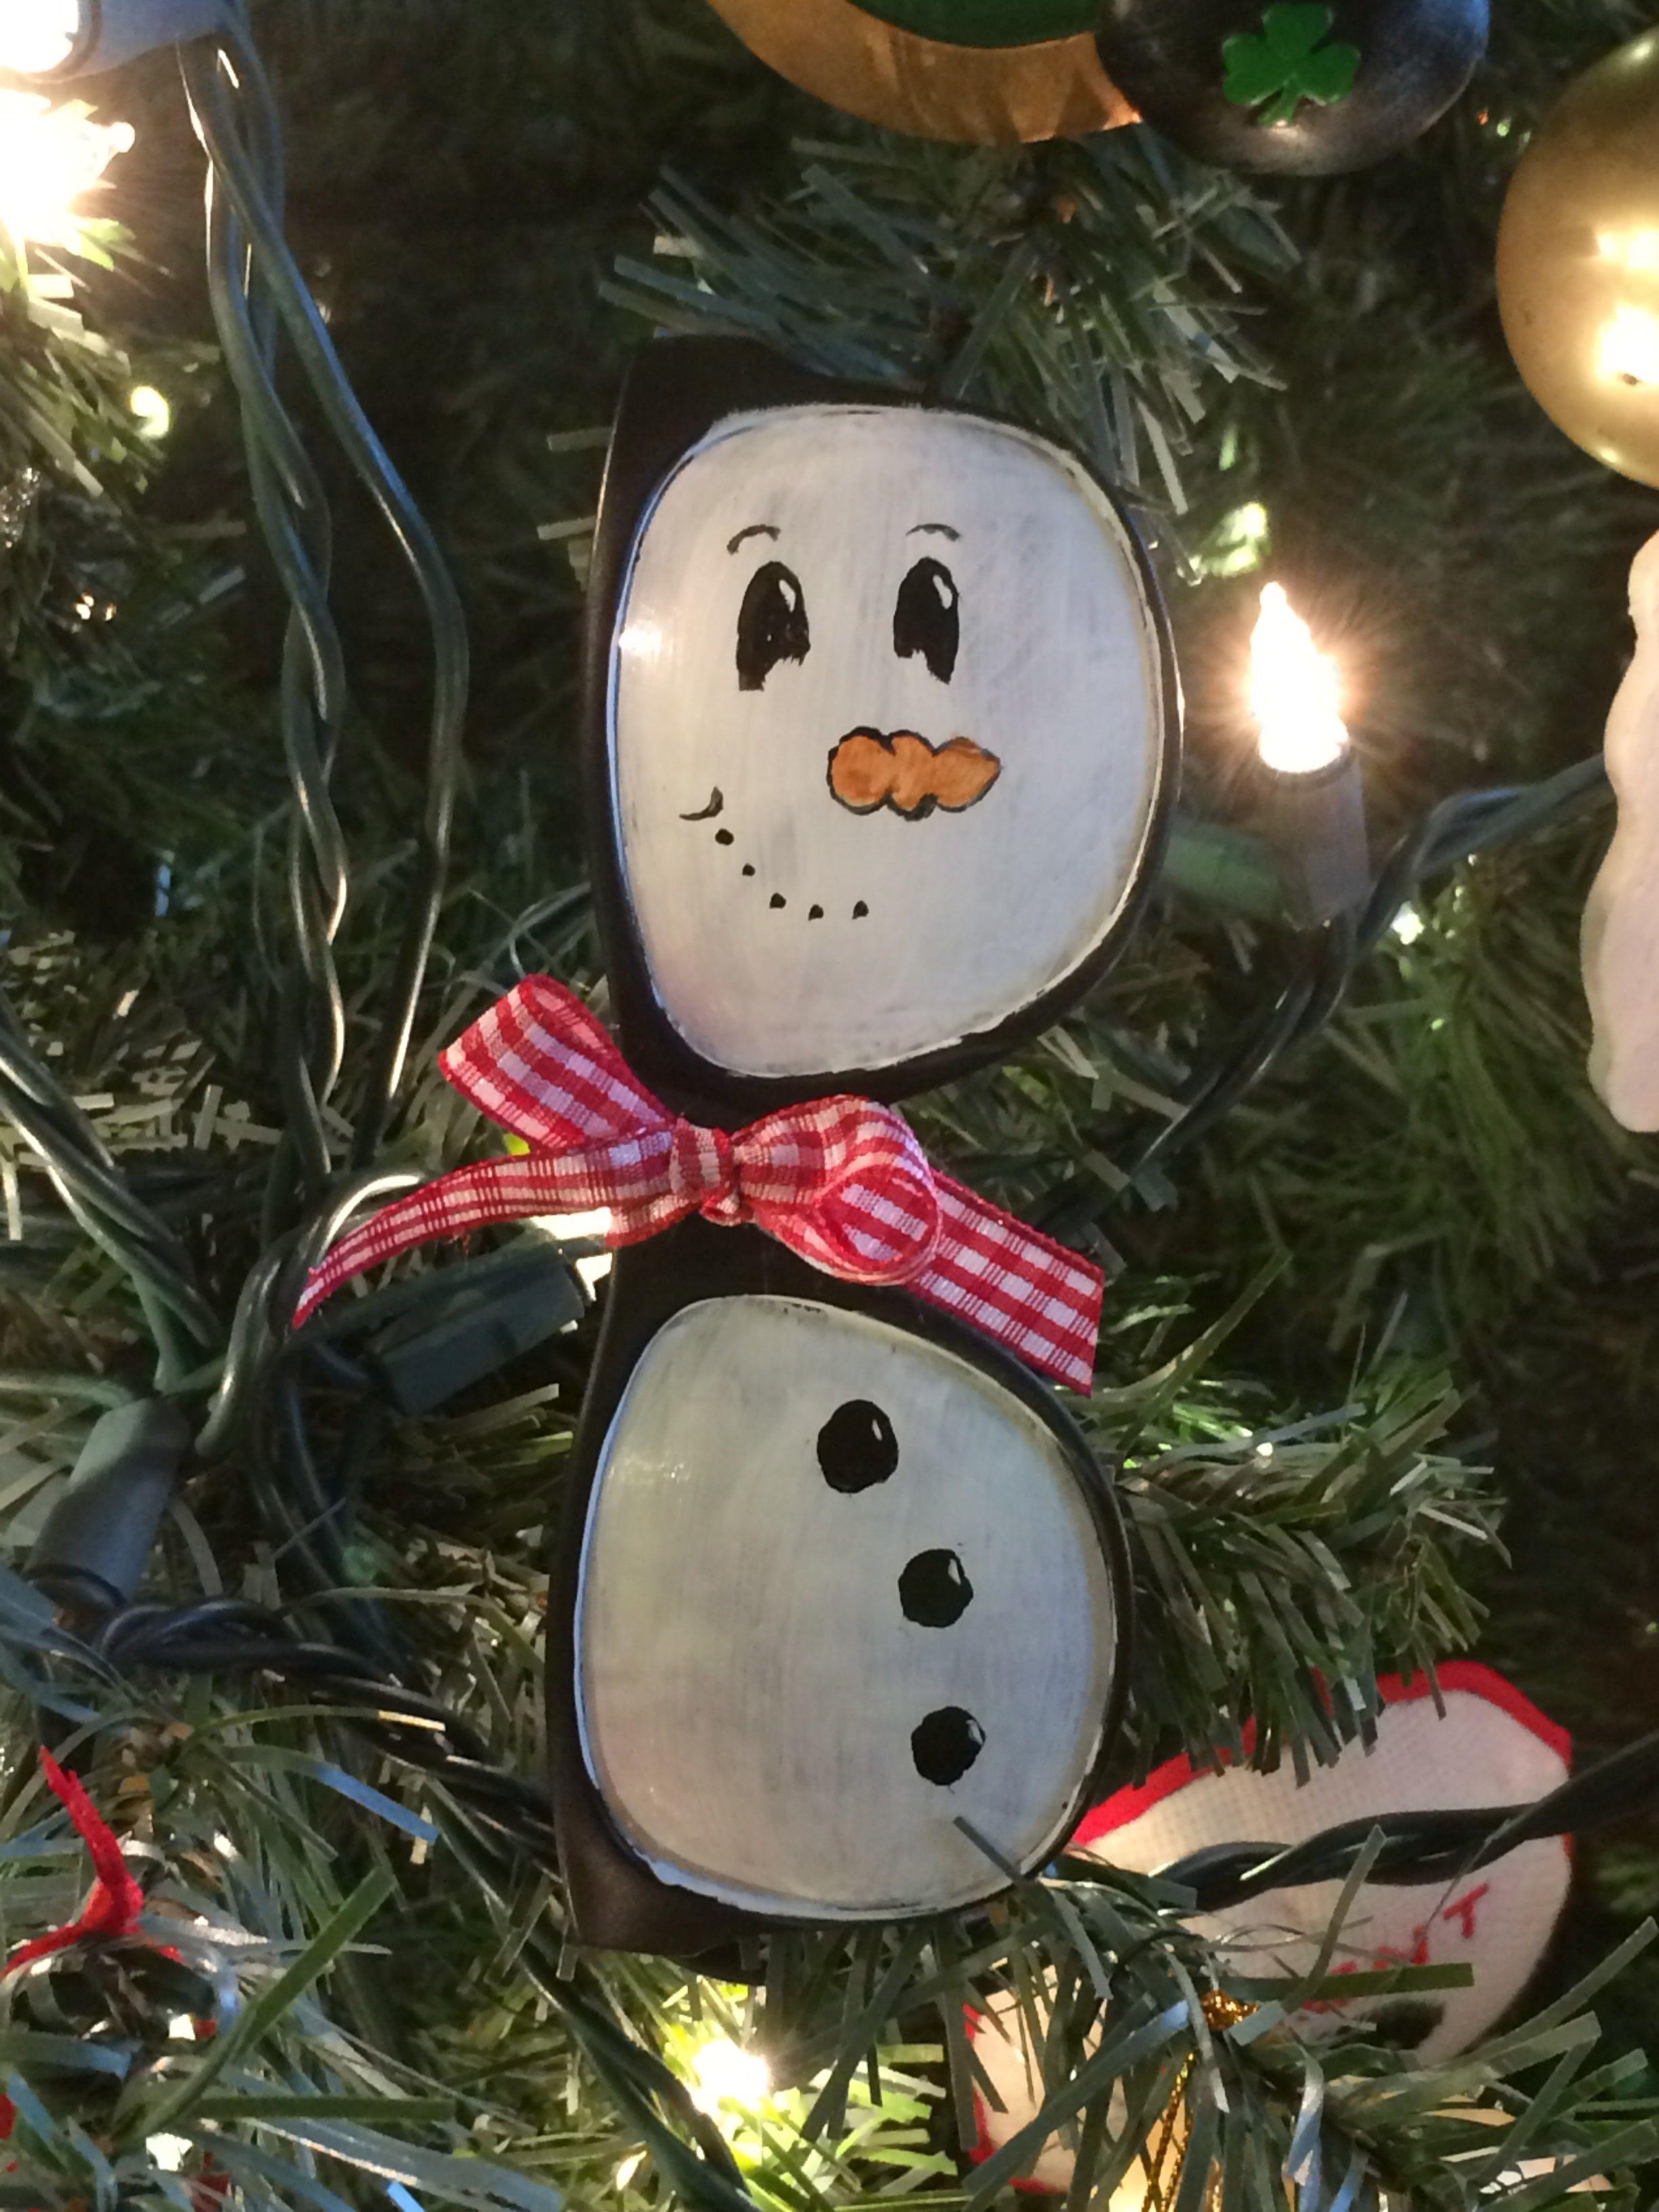 Sunglasses Snowman Ornament Christmas Crafts Diy Holiday Crafts Christmas Crafts